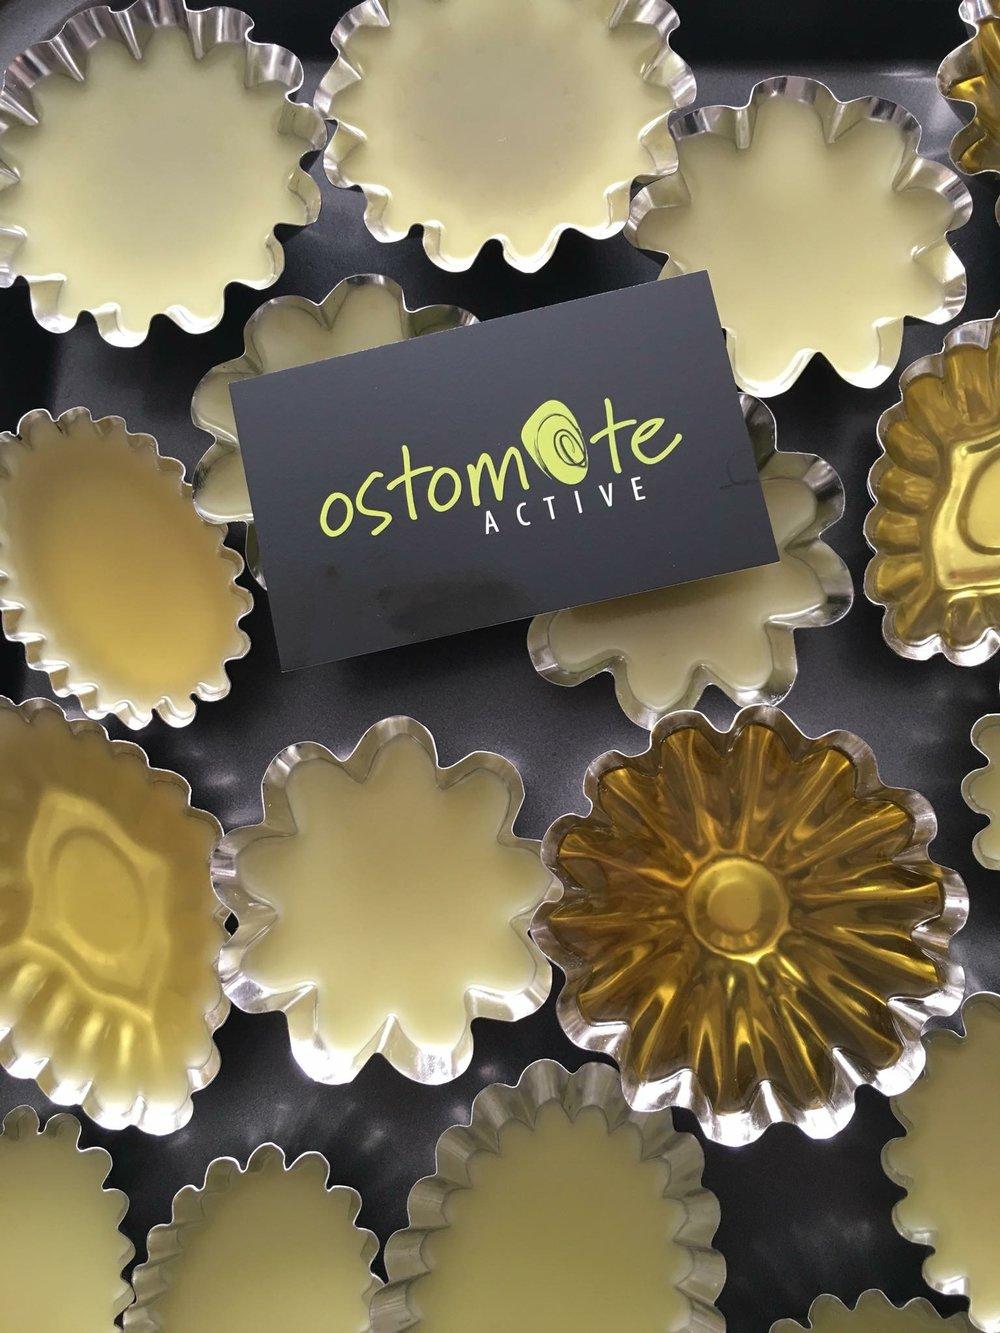 OstomateActive_Melts.jpg